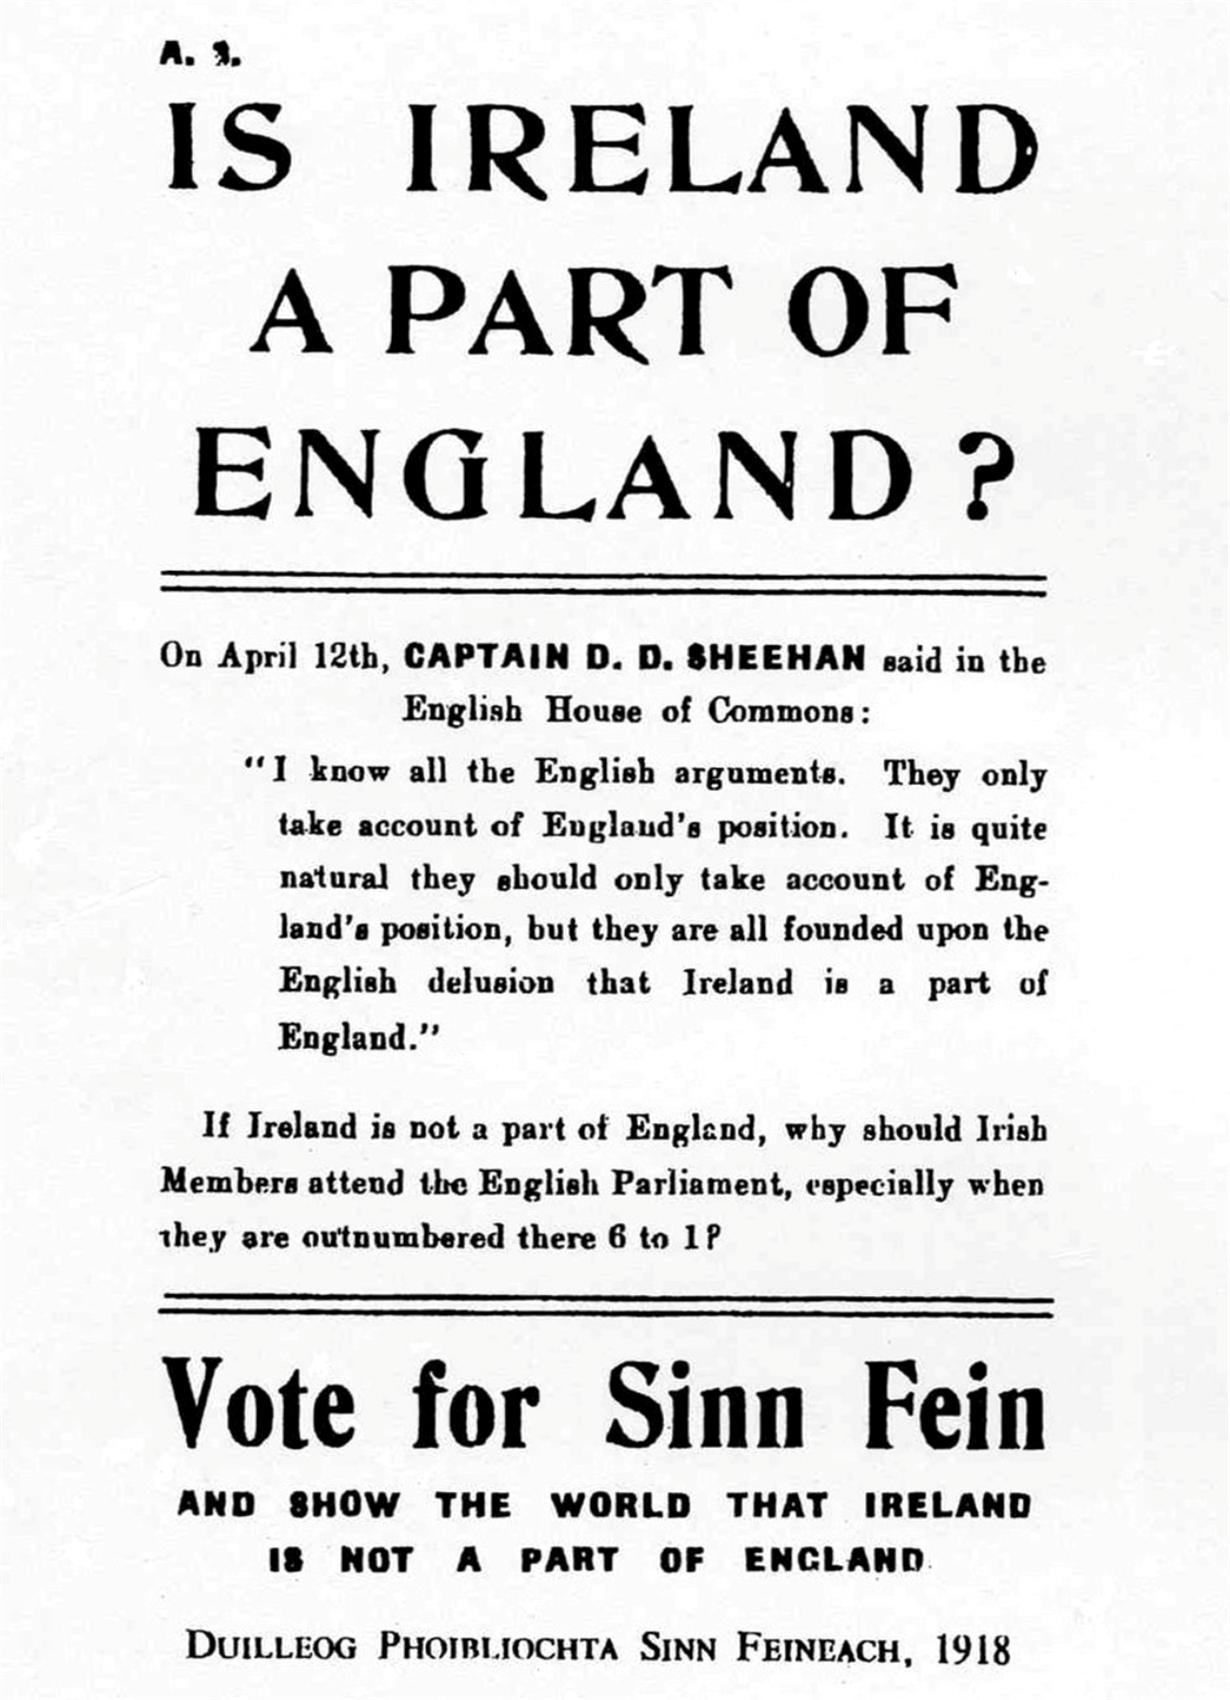 The Politics of Illusion: A Political History of Sinn Féin and the IRA